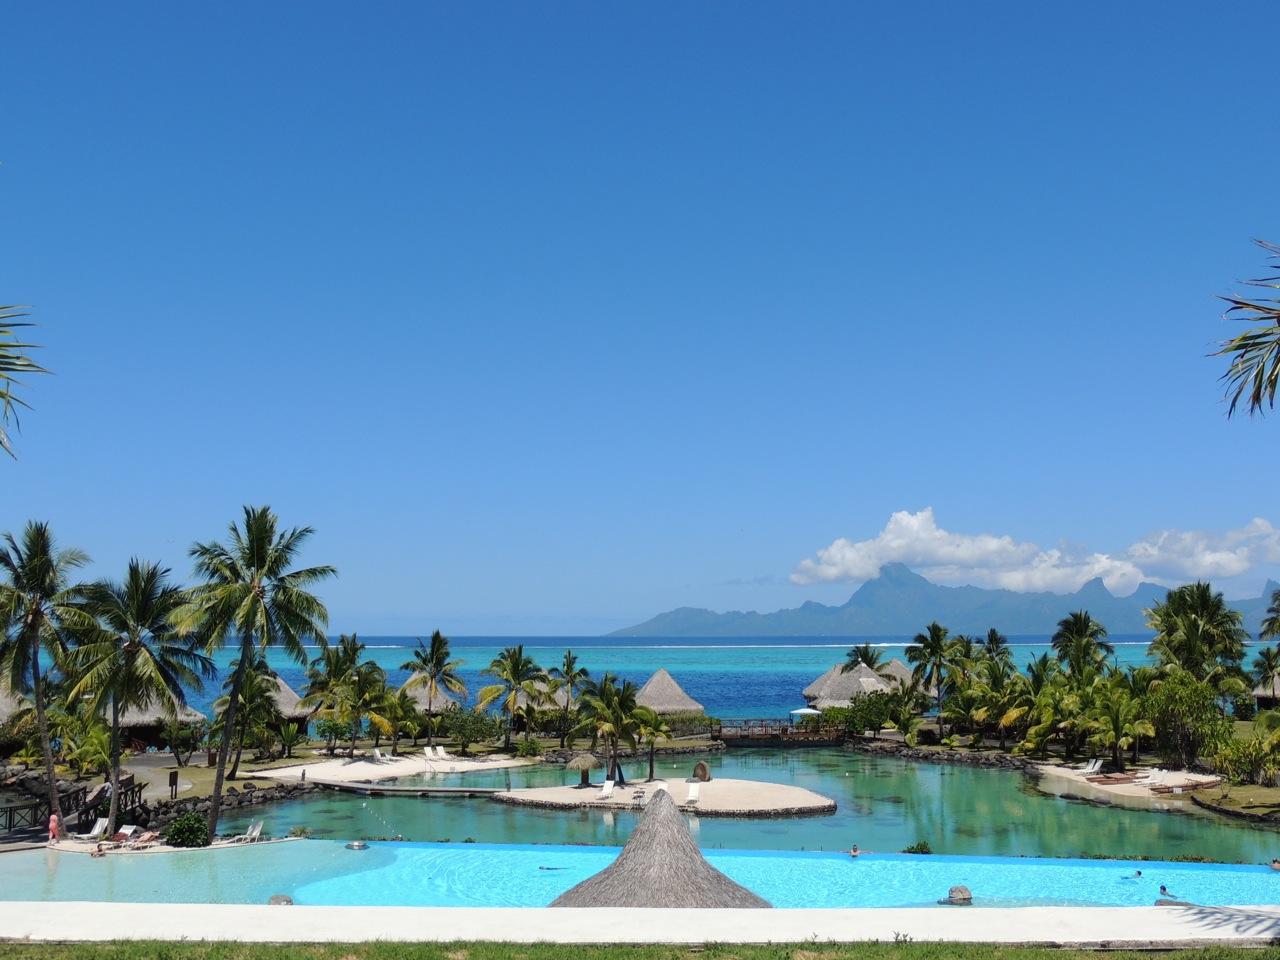 Intercontinental Tahiti with its pool and lagoonarium